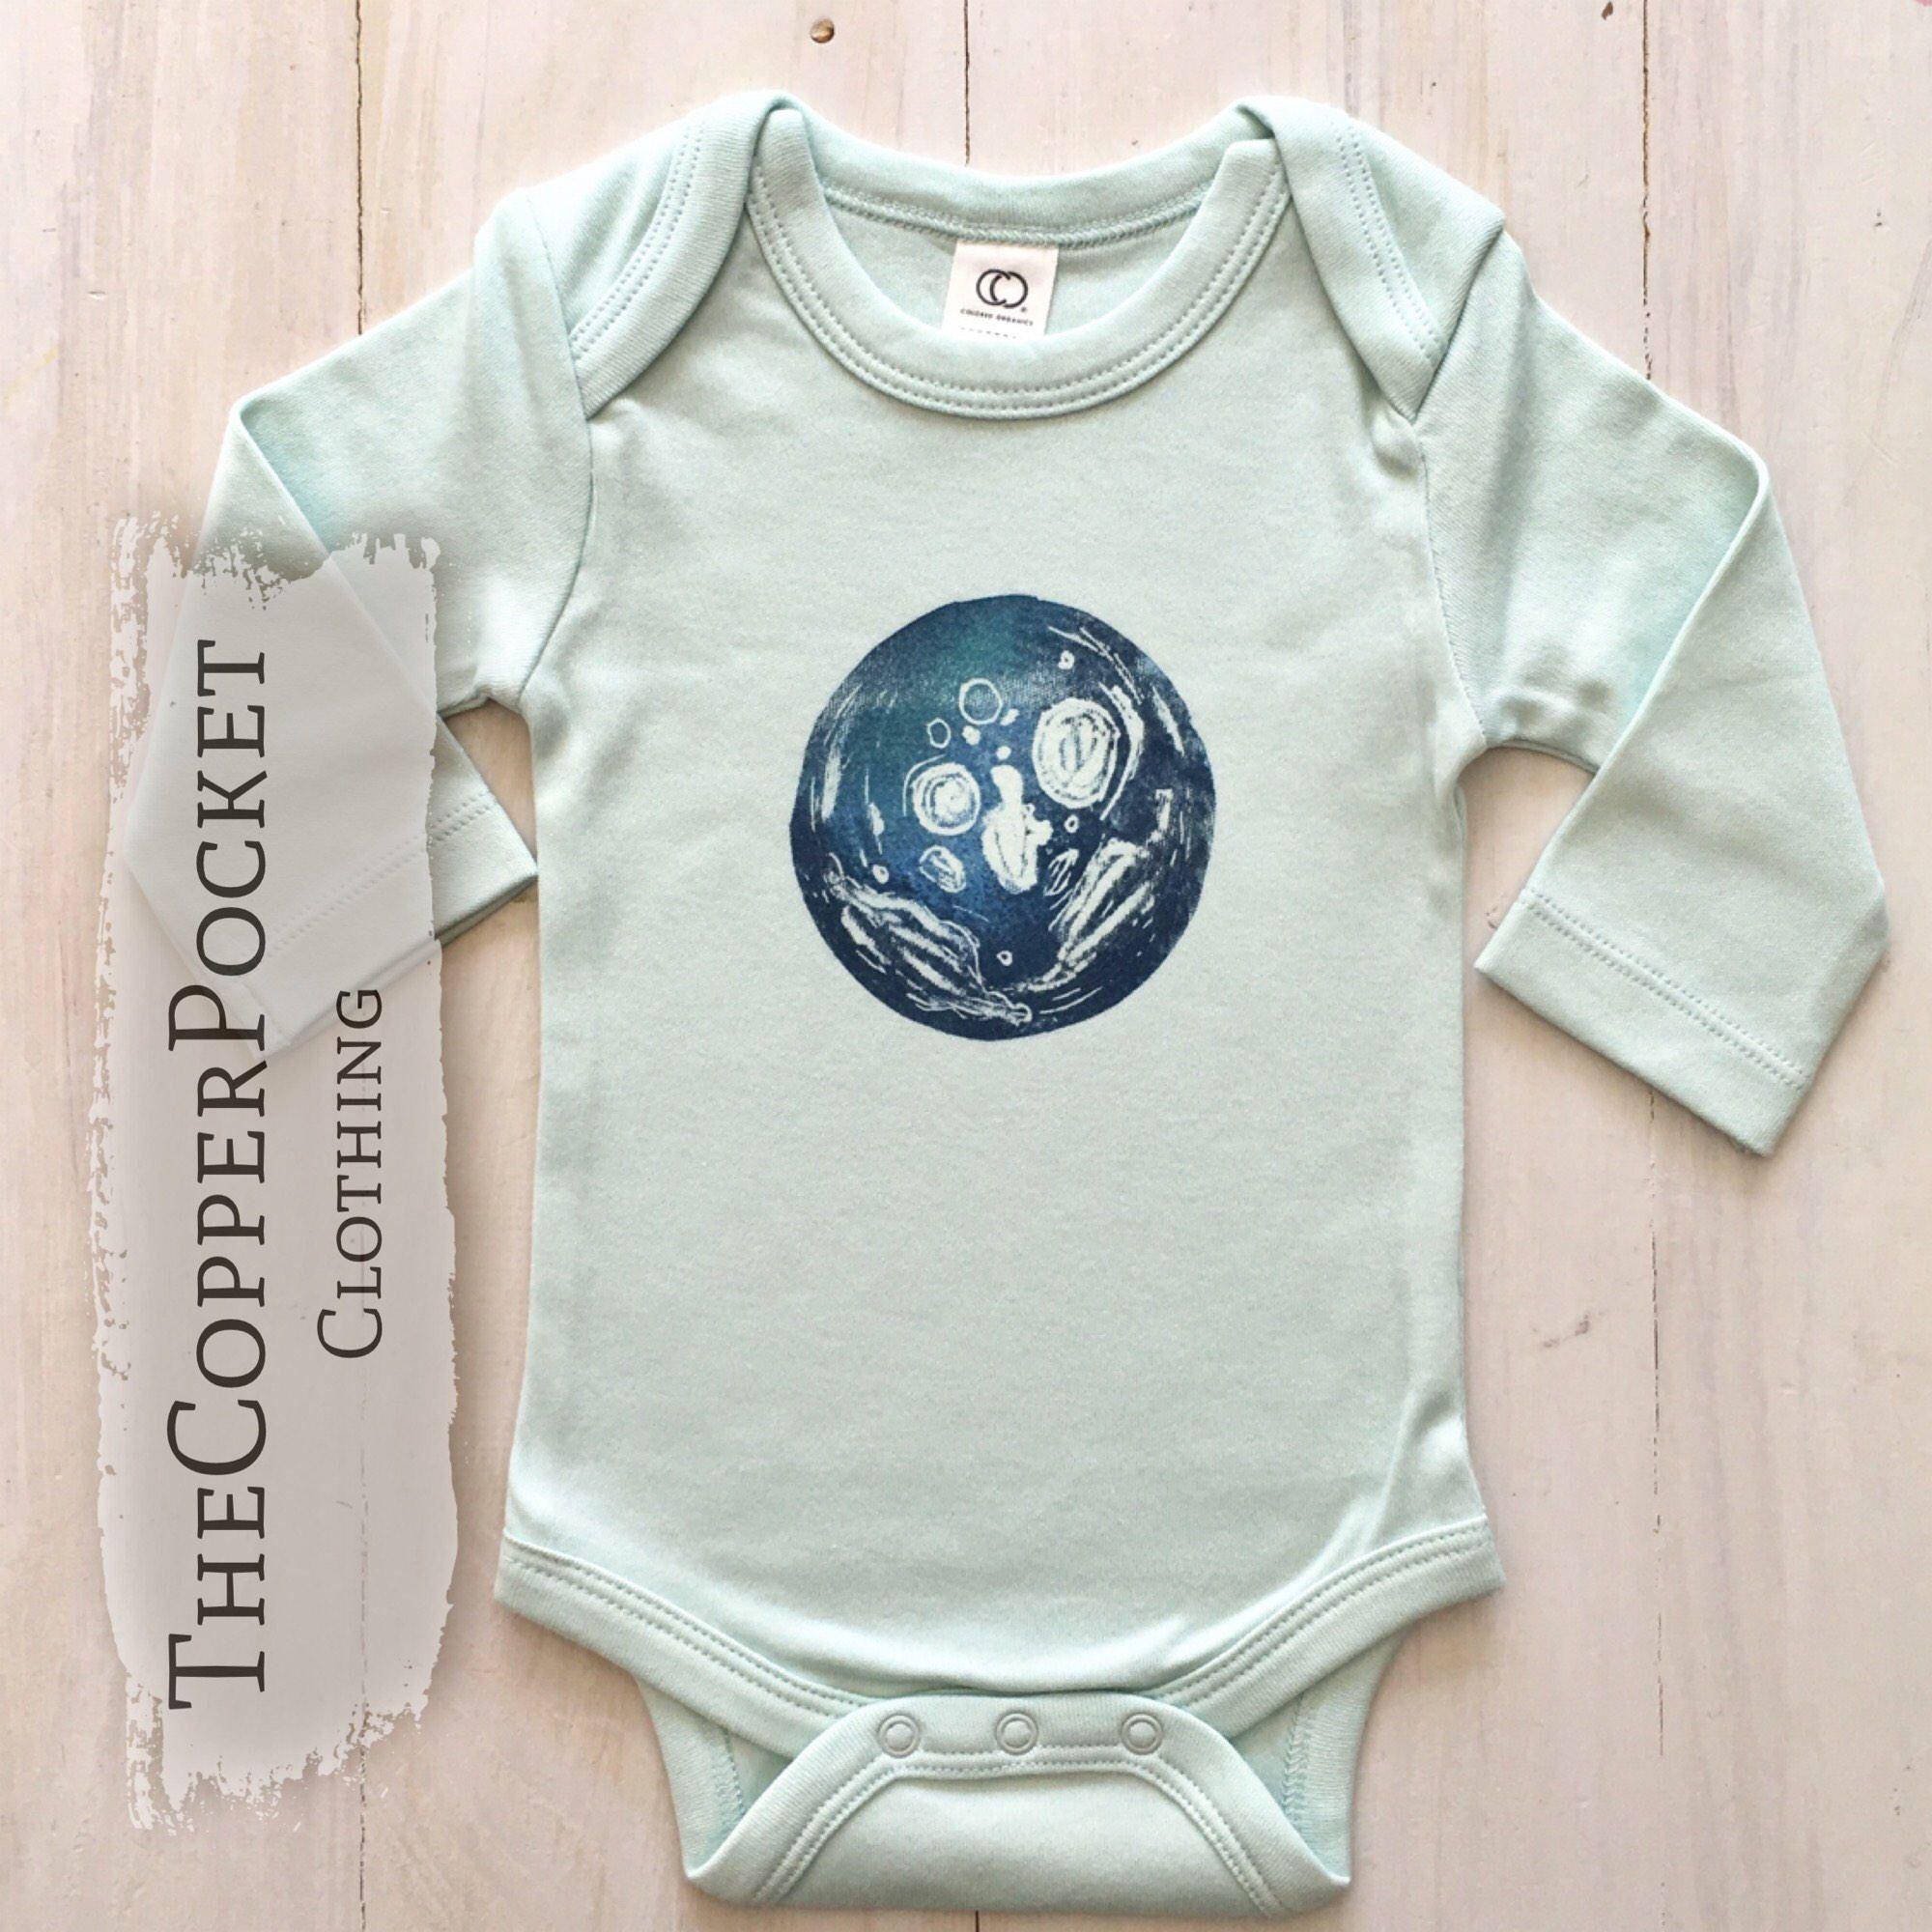 Lunar moon baby onesie organic baby clothing newborn baby clothes